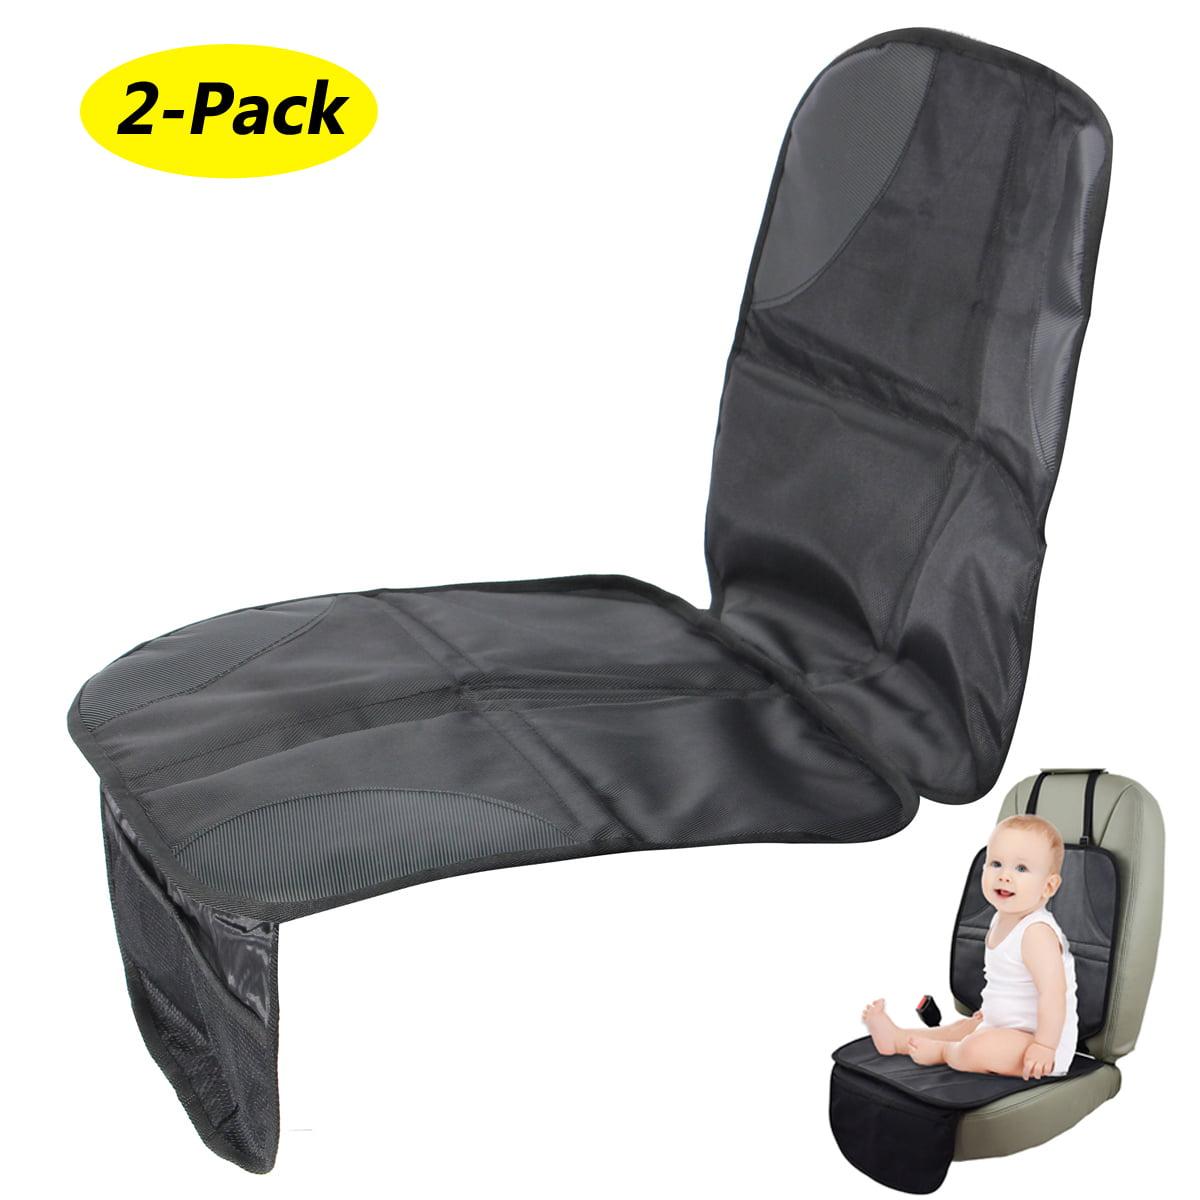 2-Pack Black  Infant Baby Car Seat Protector Mat Cushion Anti Slip Waterproof Easy Clean